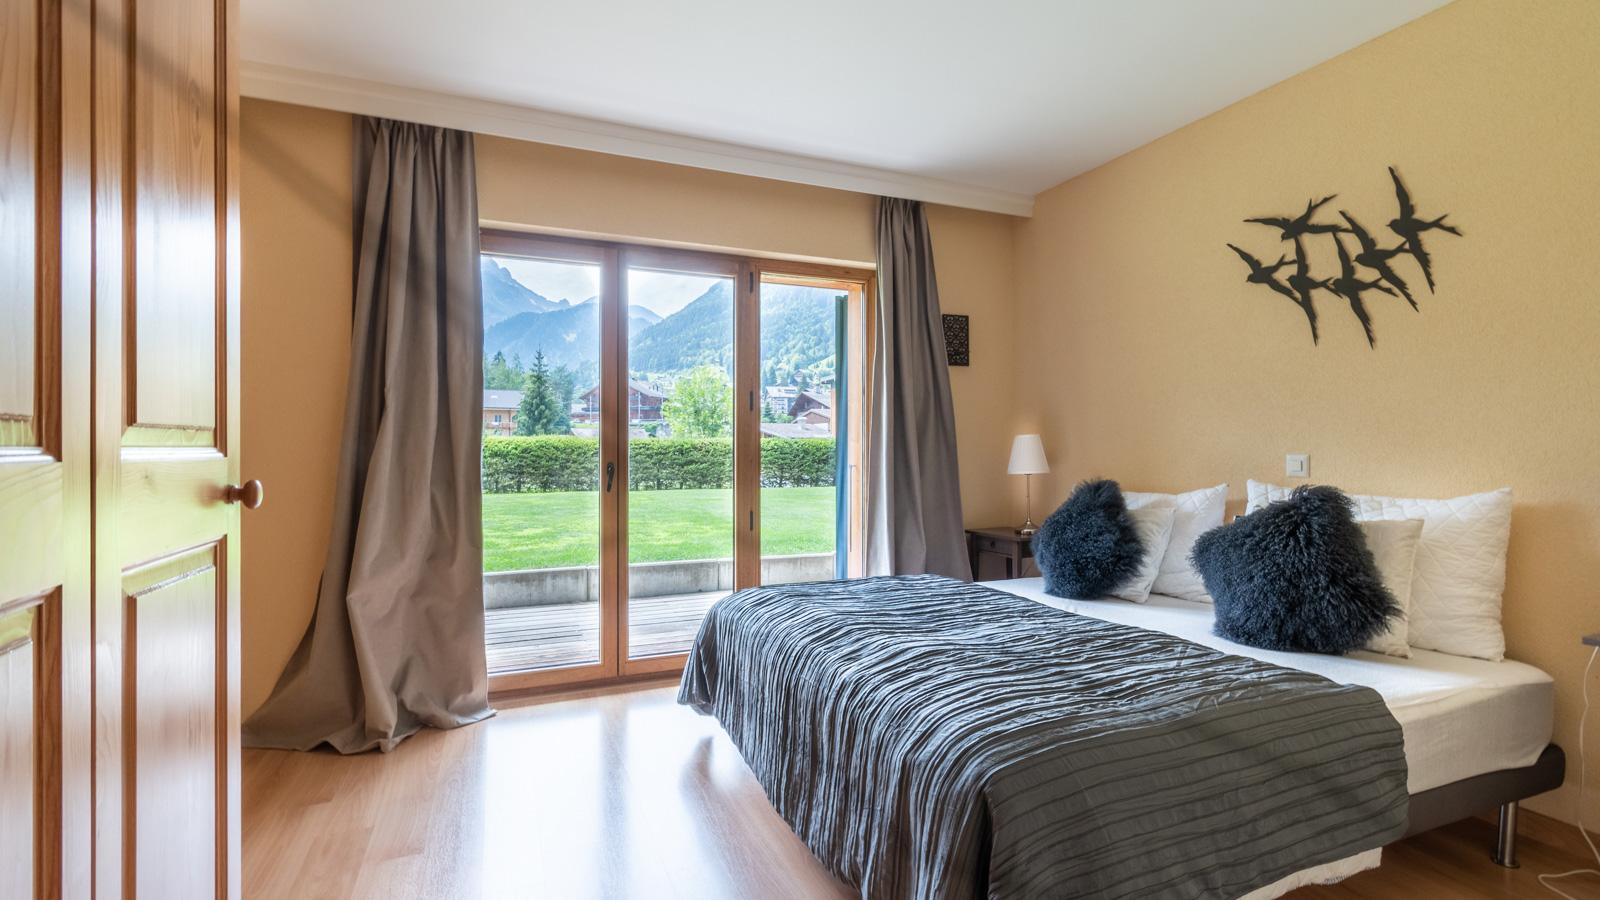 Neige et Soleil Apartments, Switzerland